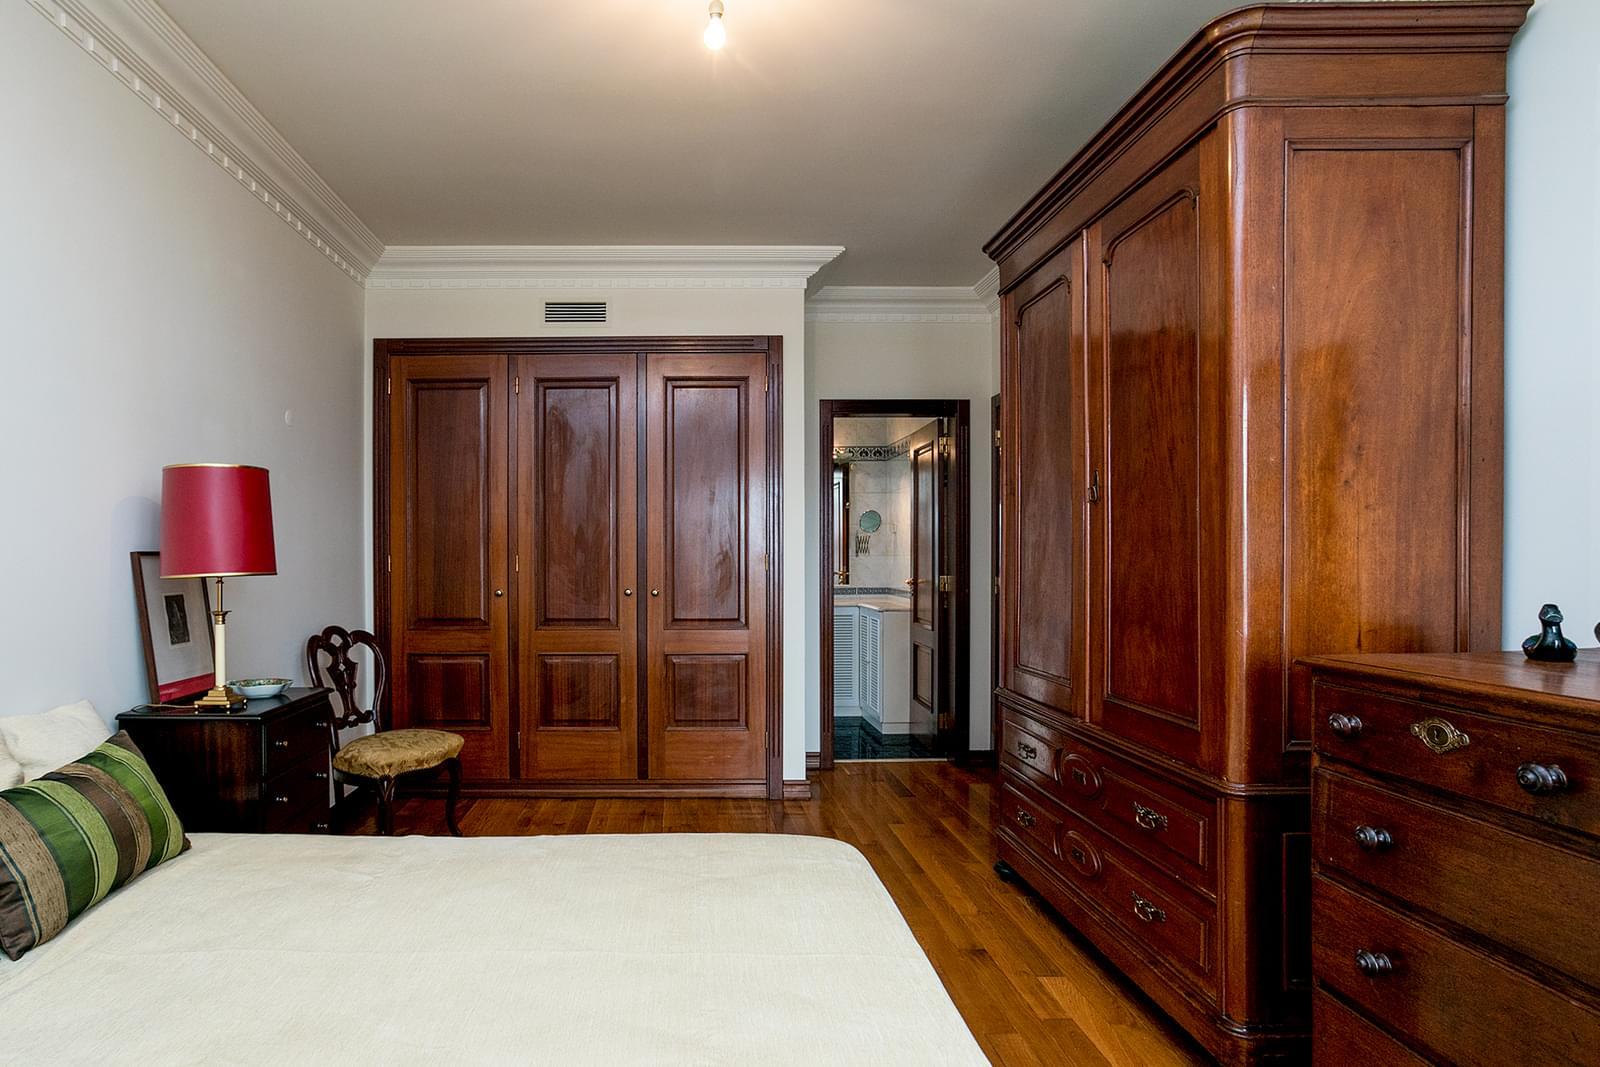 pf17352-apartamento-t3-lisboa-8bc1c8cd-6e21-49b5-9780-fe0421be8e65